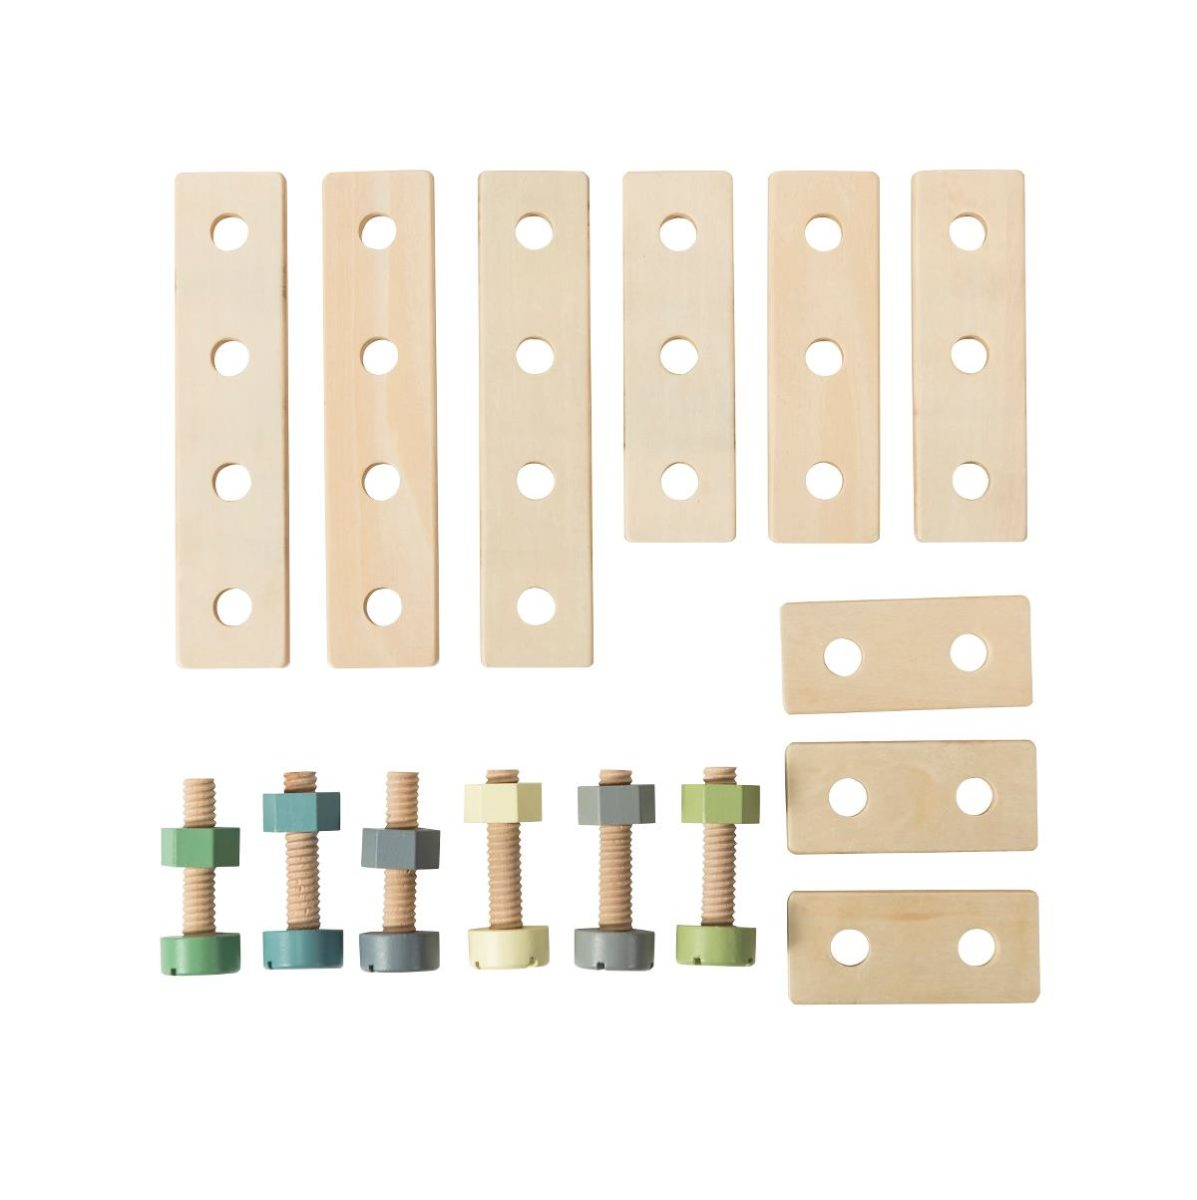 sebra Bau-Spielset aus Holz 3017302 - 01